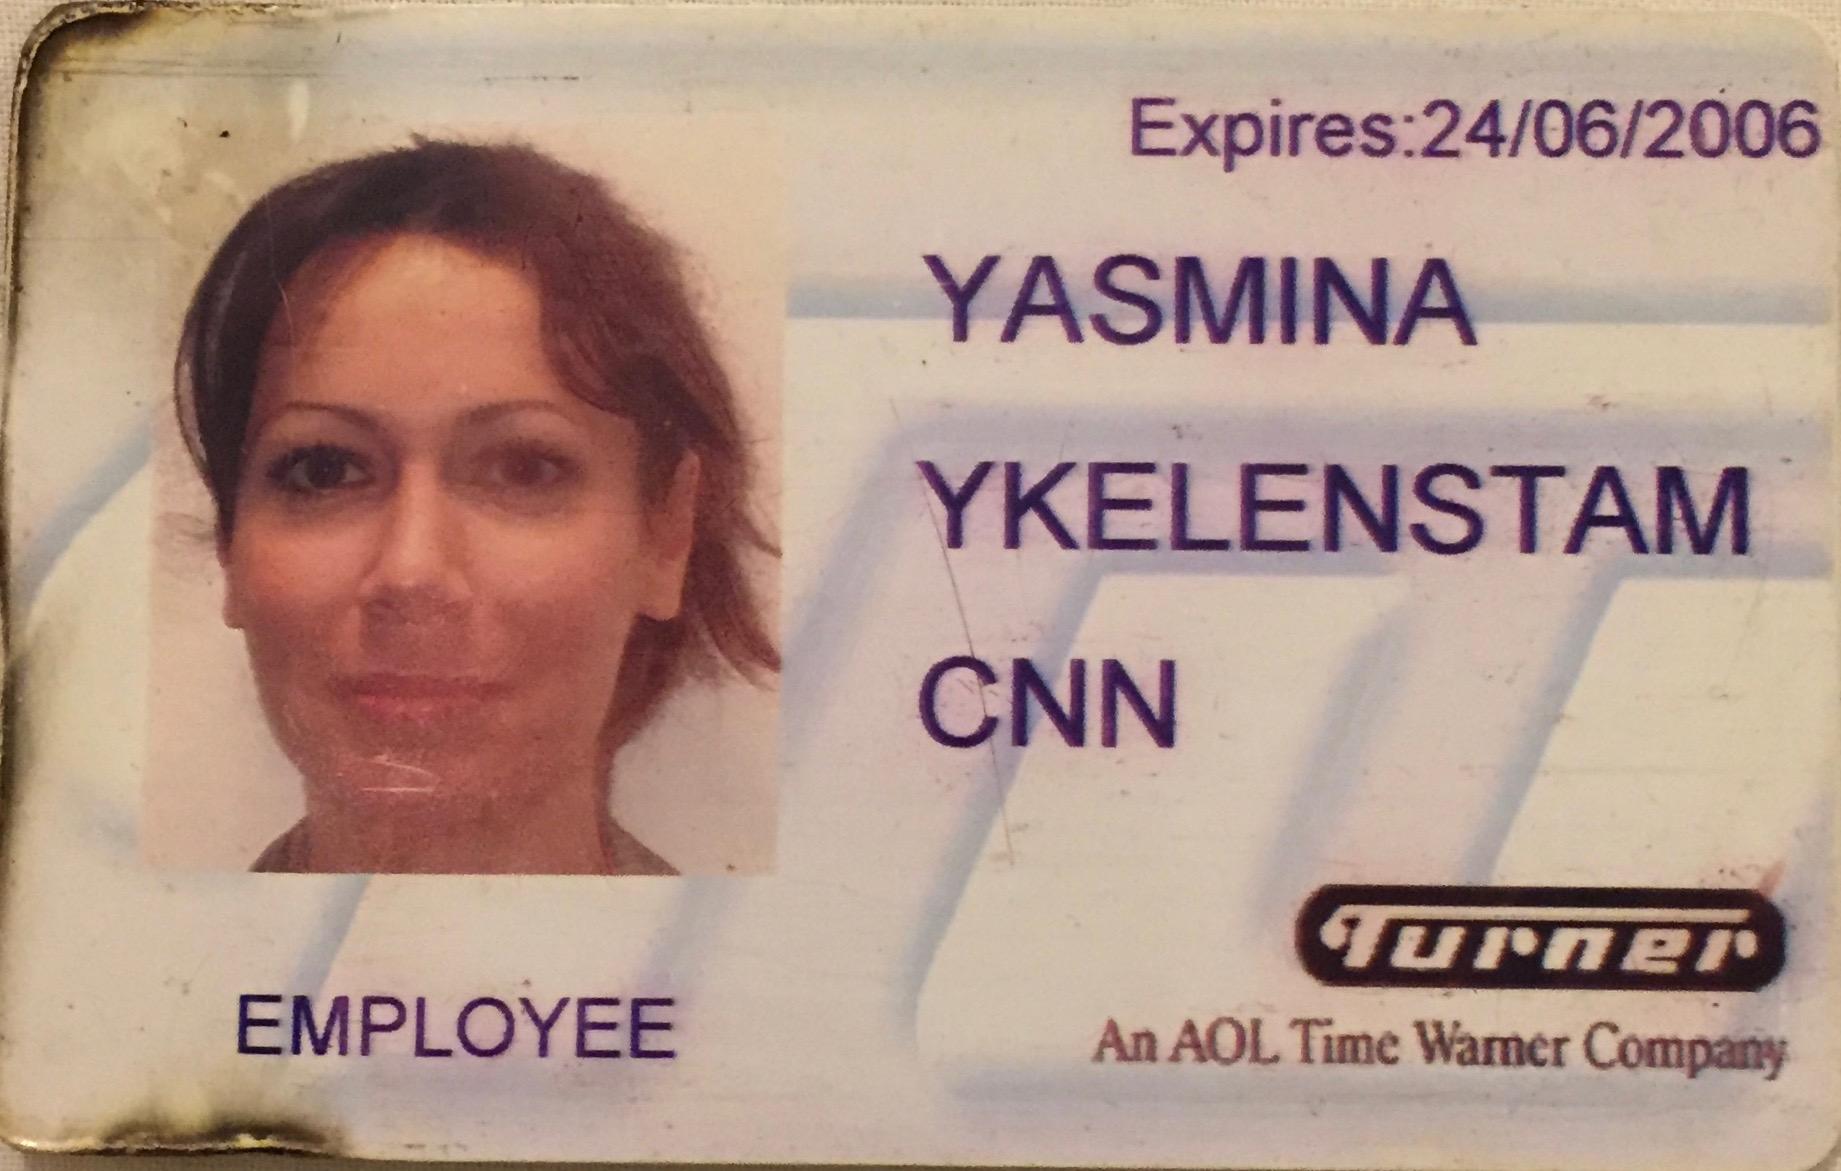 yasmina ykelenstam CNN